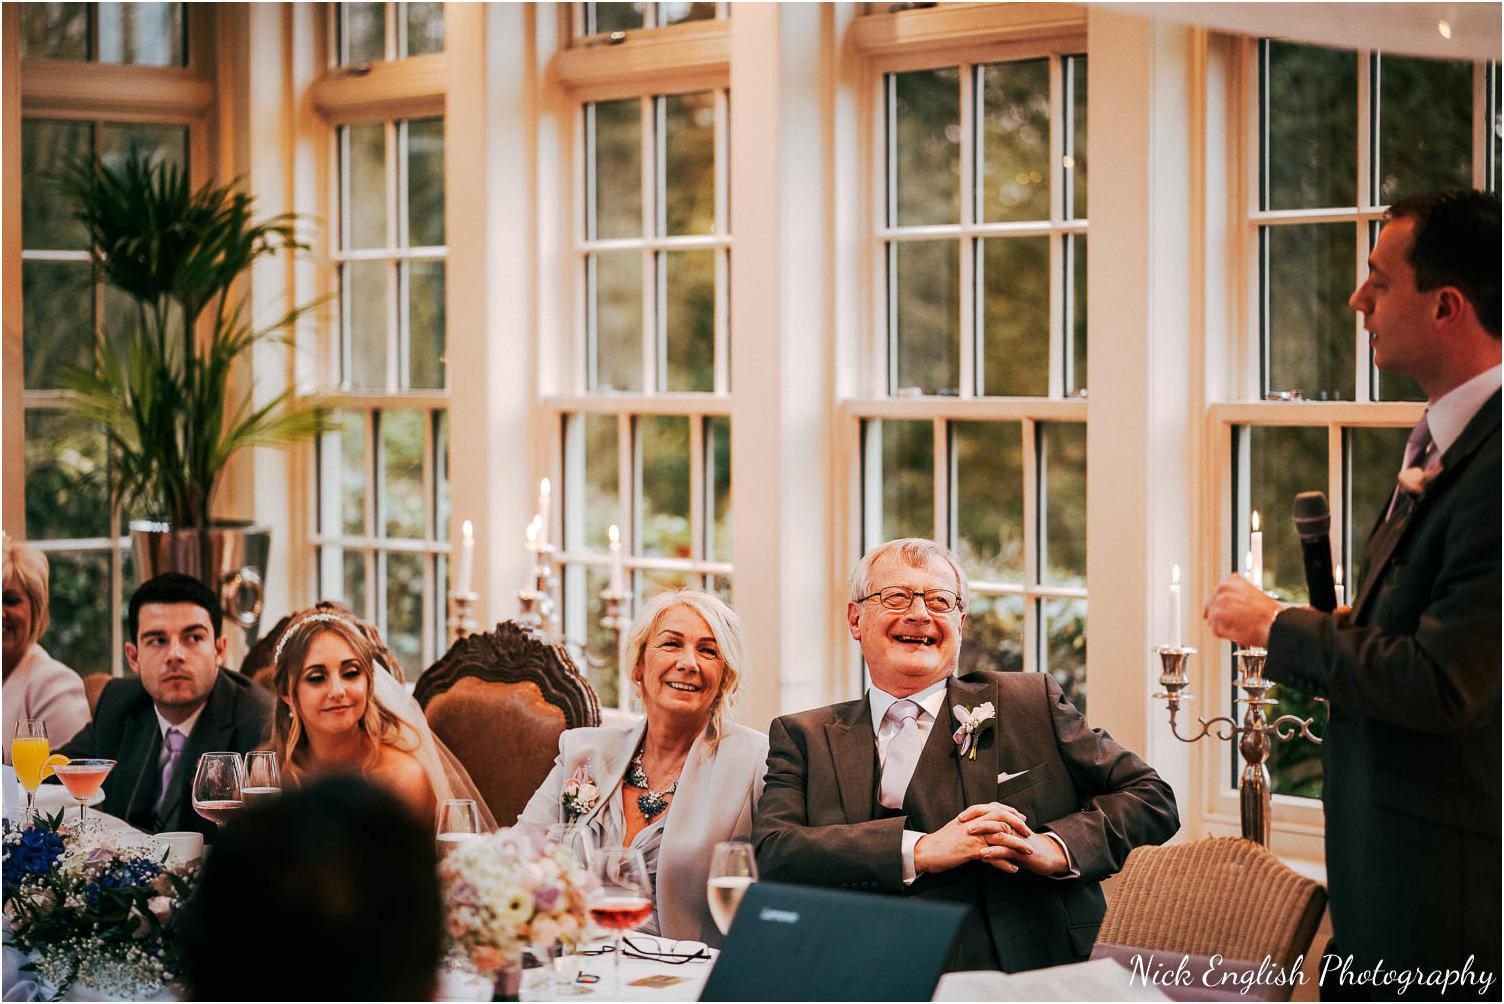 Mitton_Hall_Wedding_Photographer_2018-136.jpg